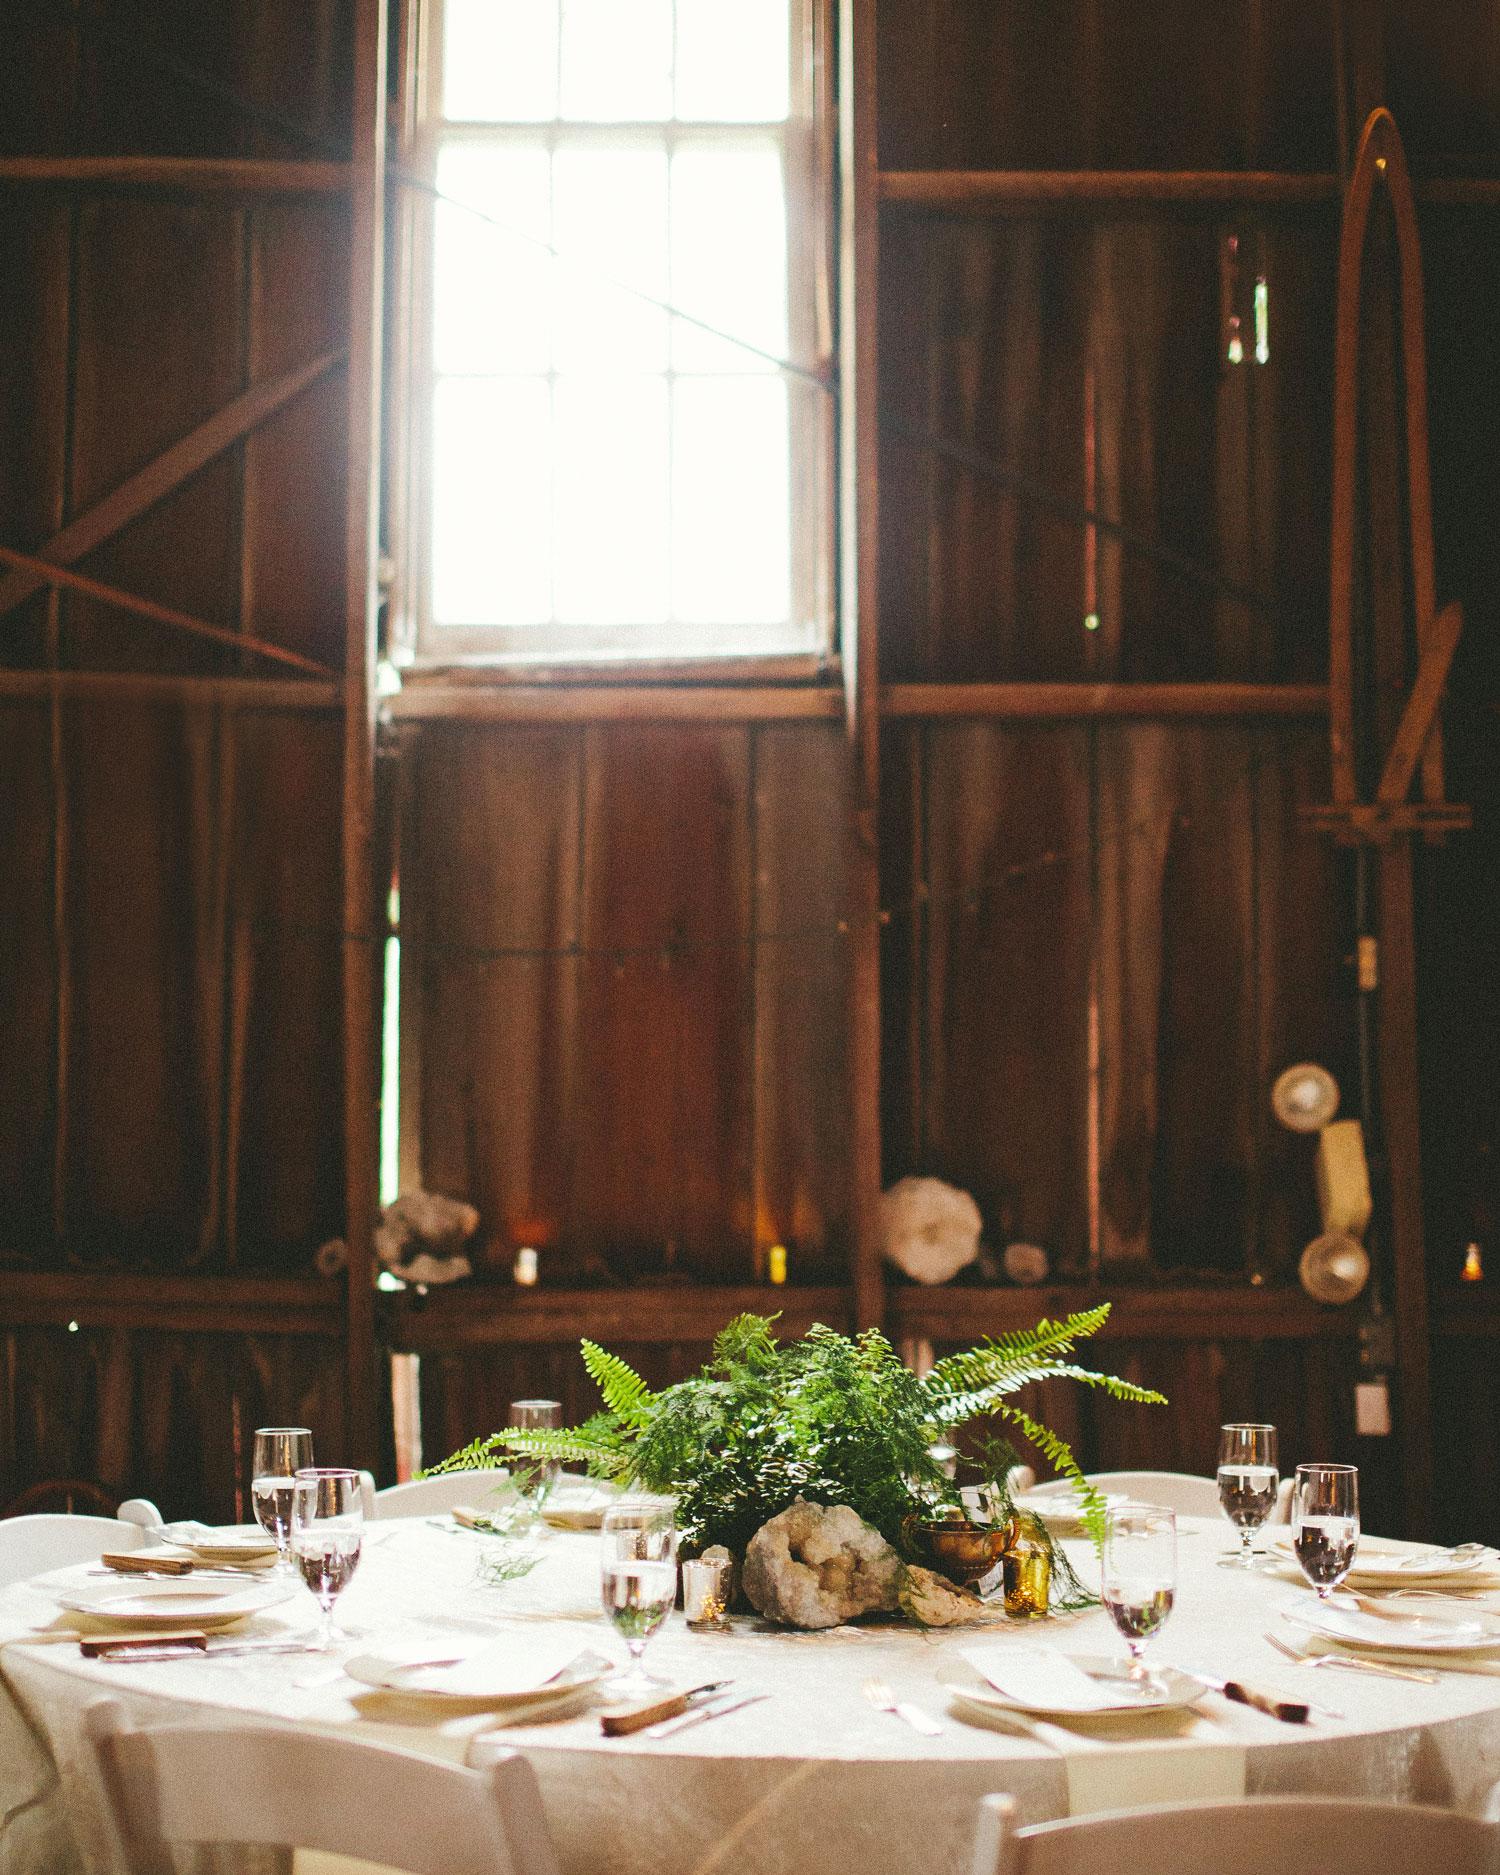 chase-drew-wedding-iowa-reception-table-432-s112425.jpg